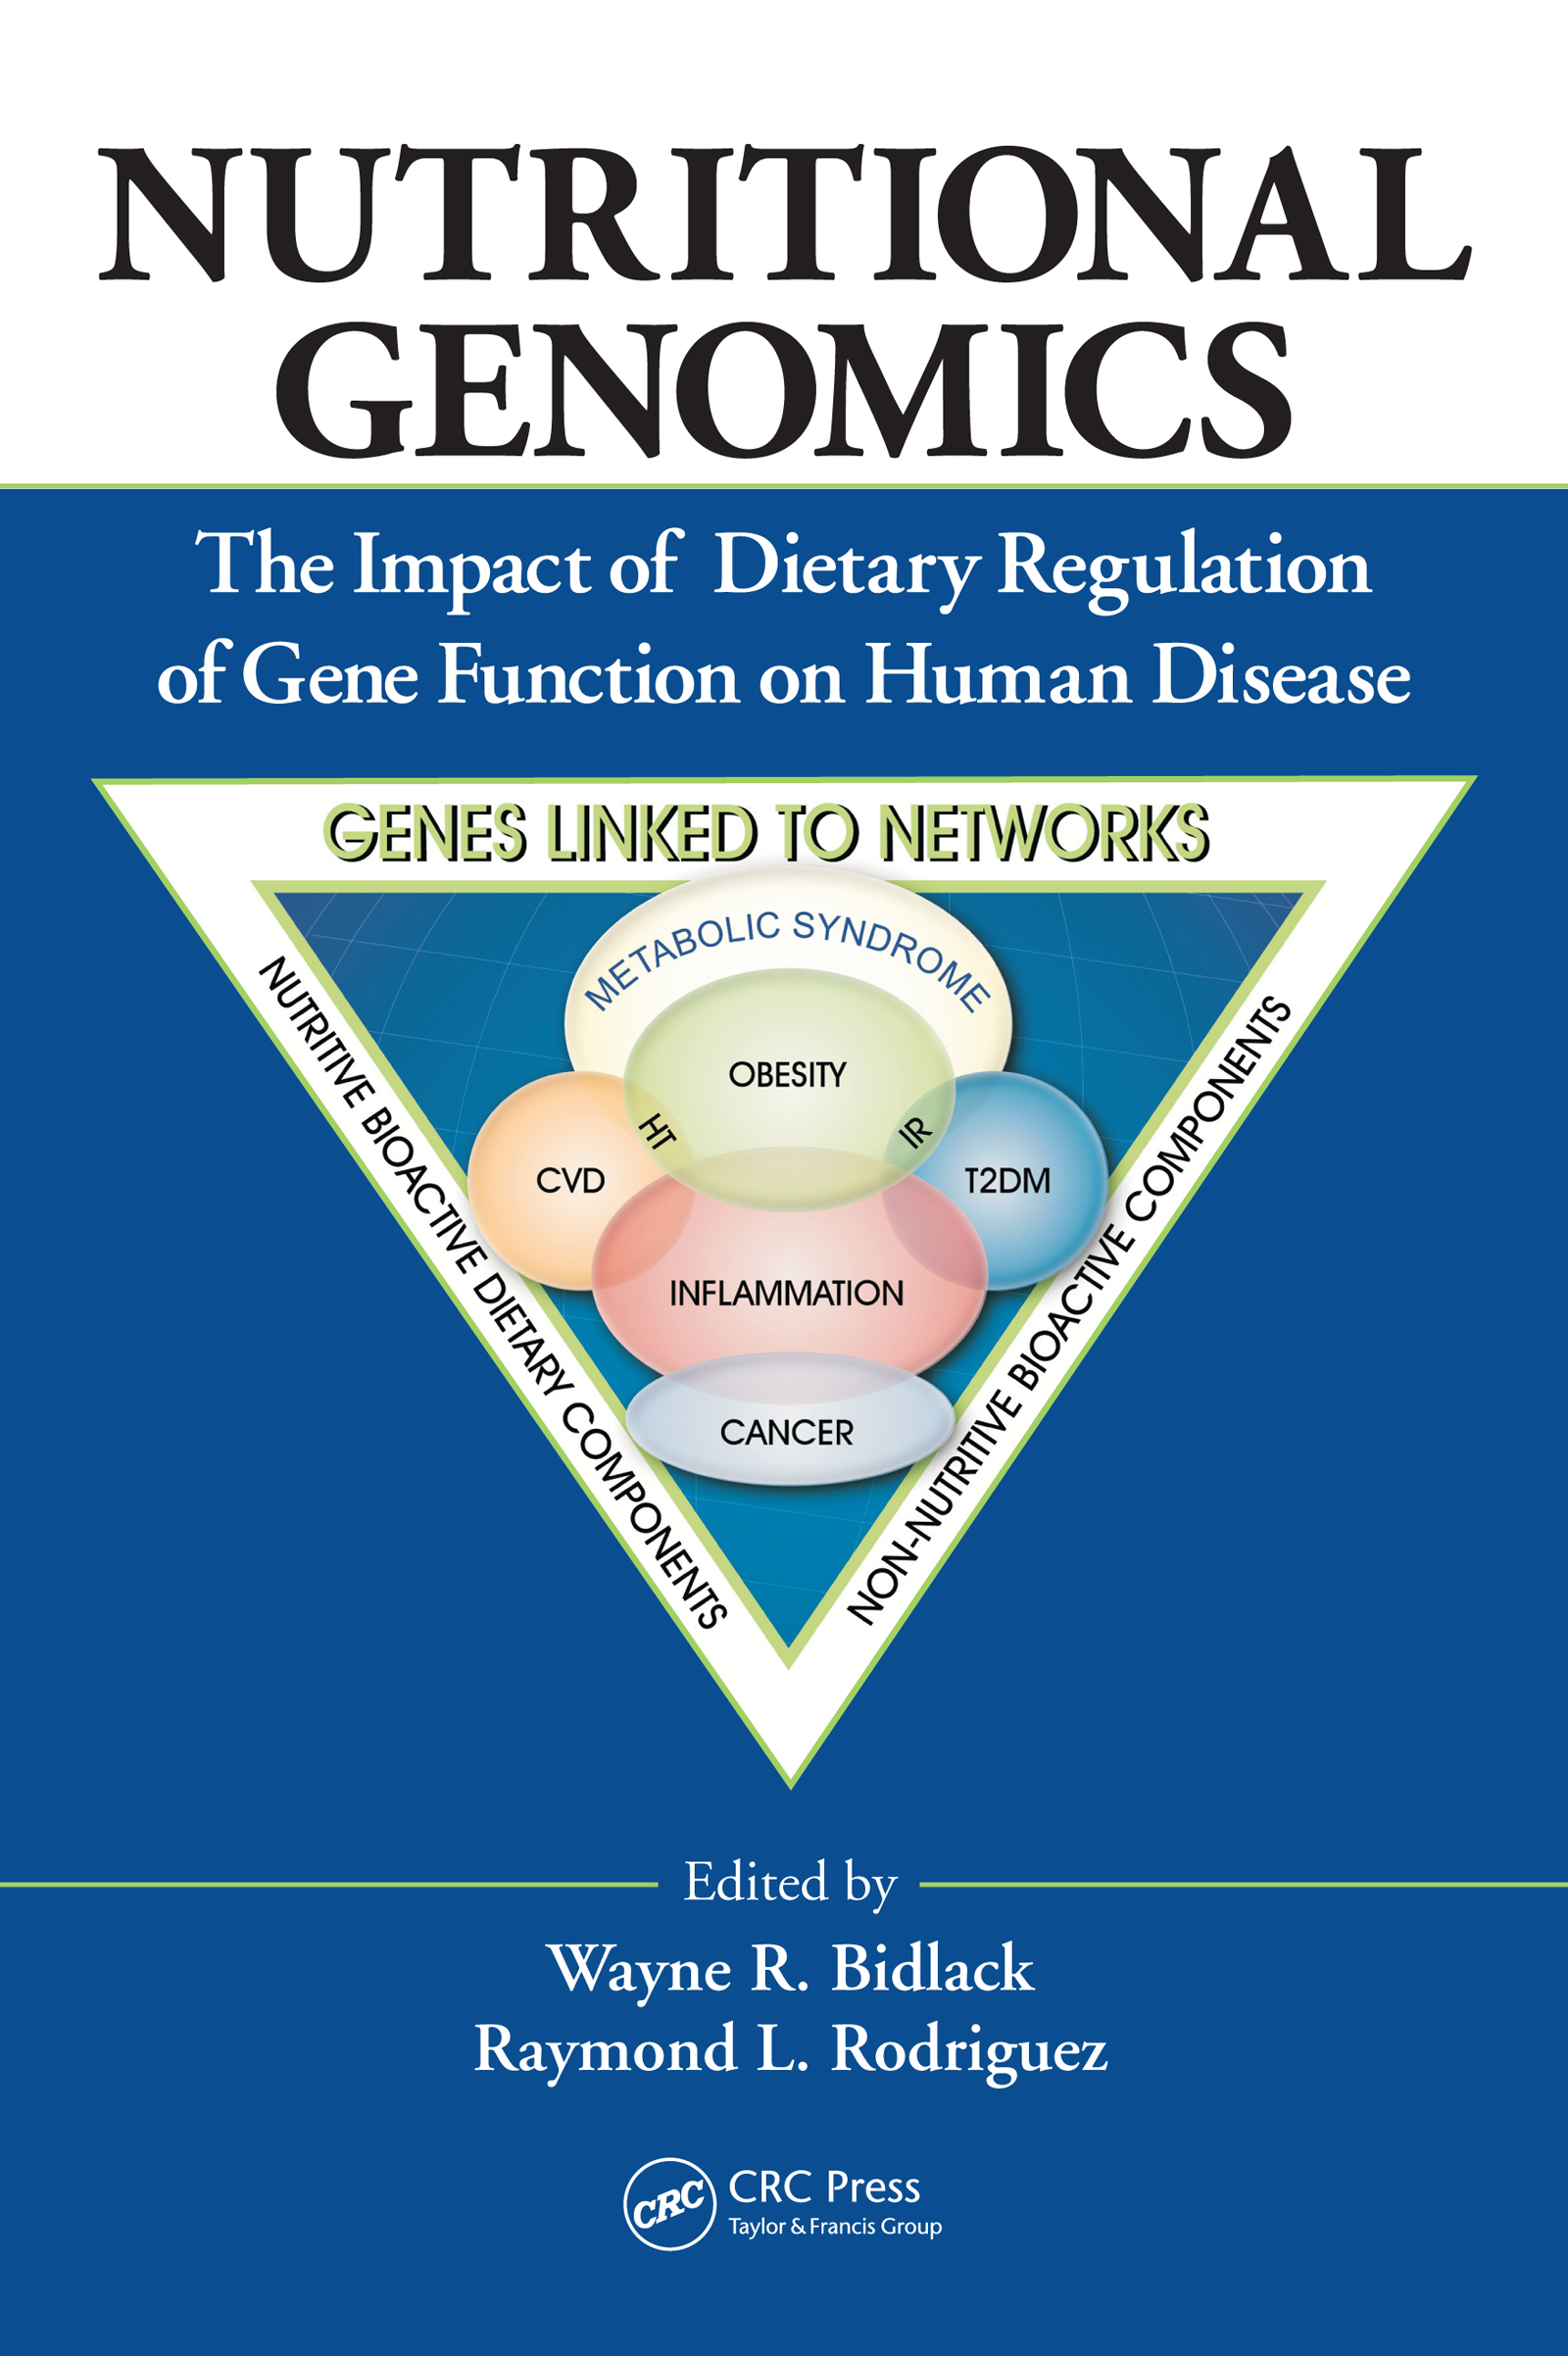 Epigenetics: Molecular Targets for Diet and Cancer Prevention